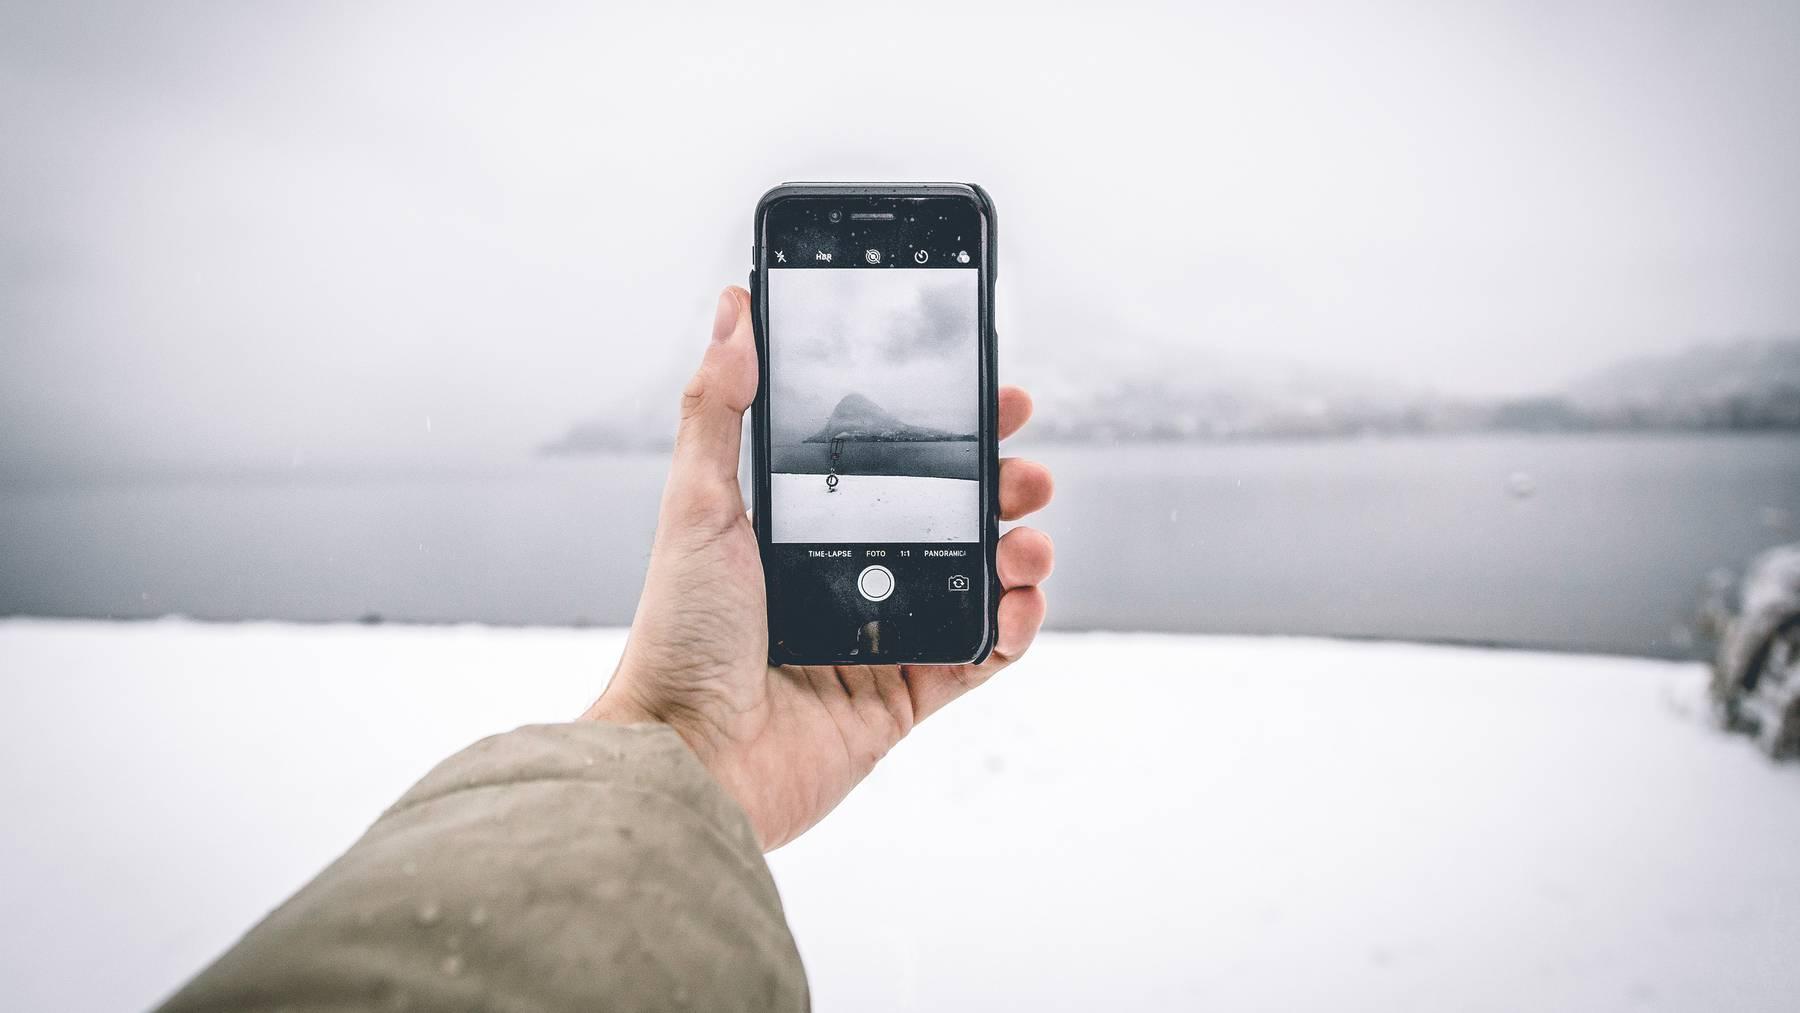 Upload Winter Smartphone